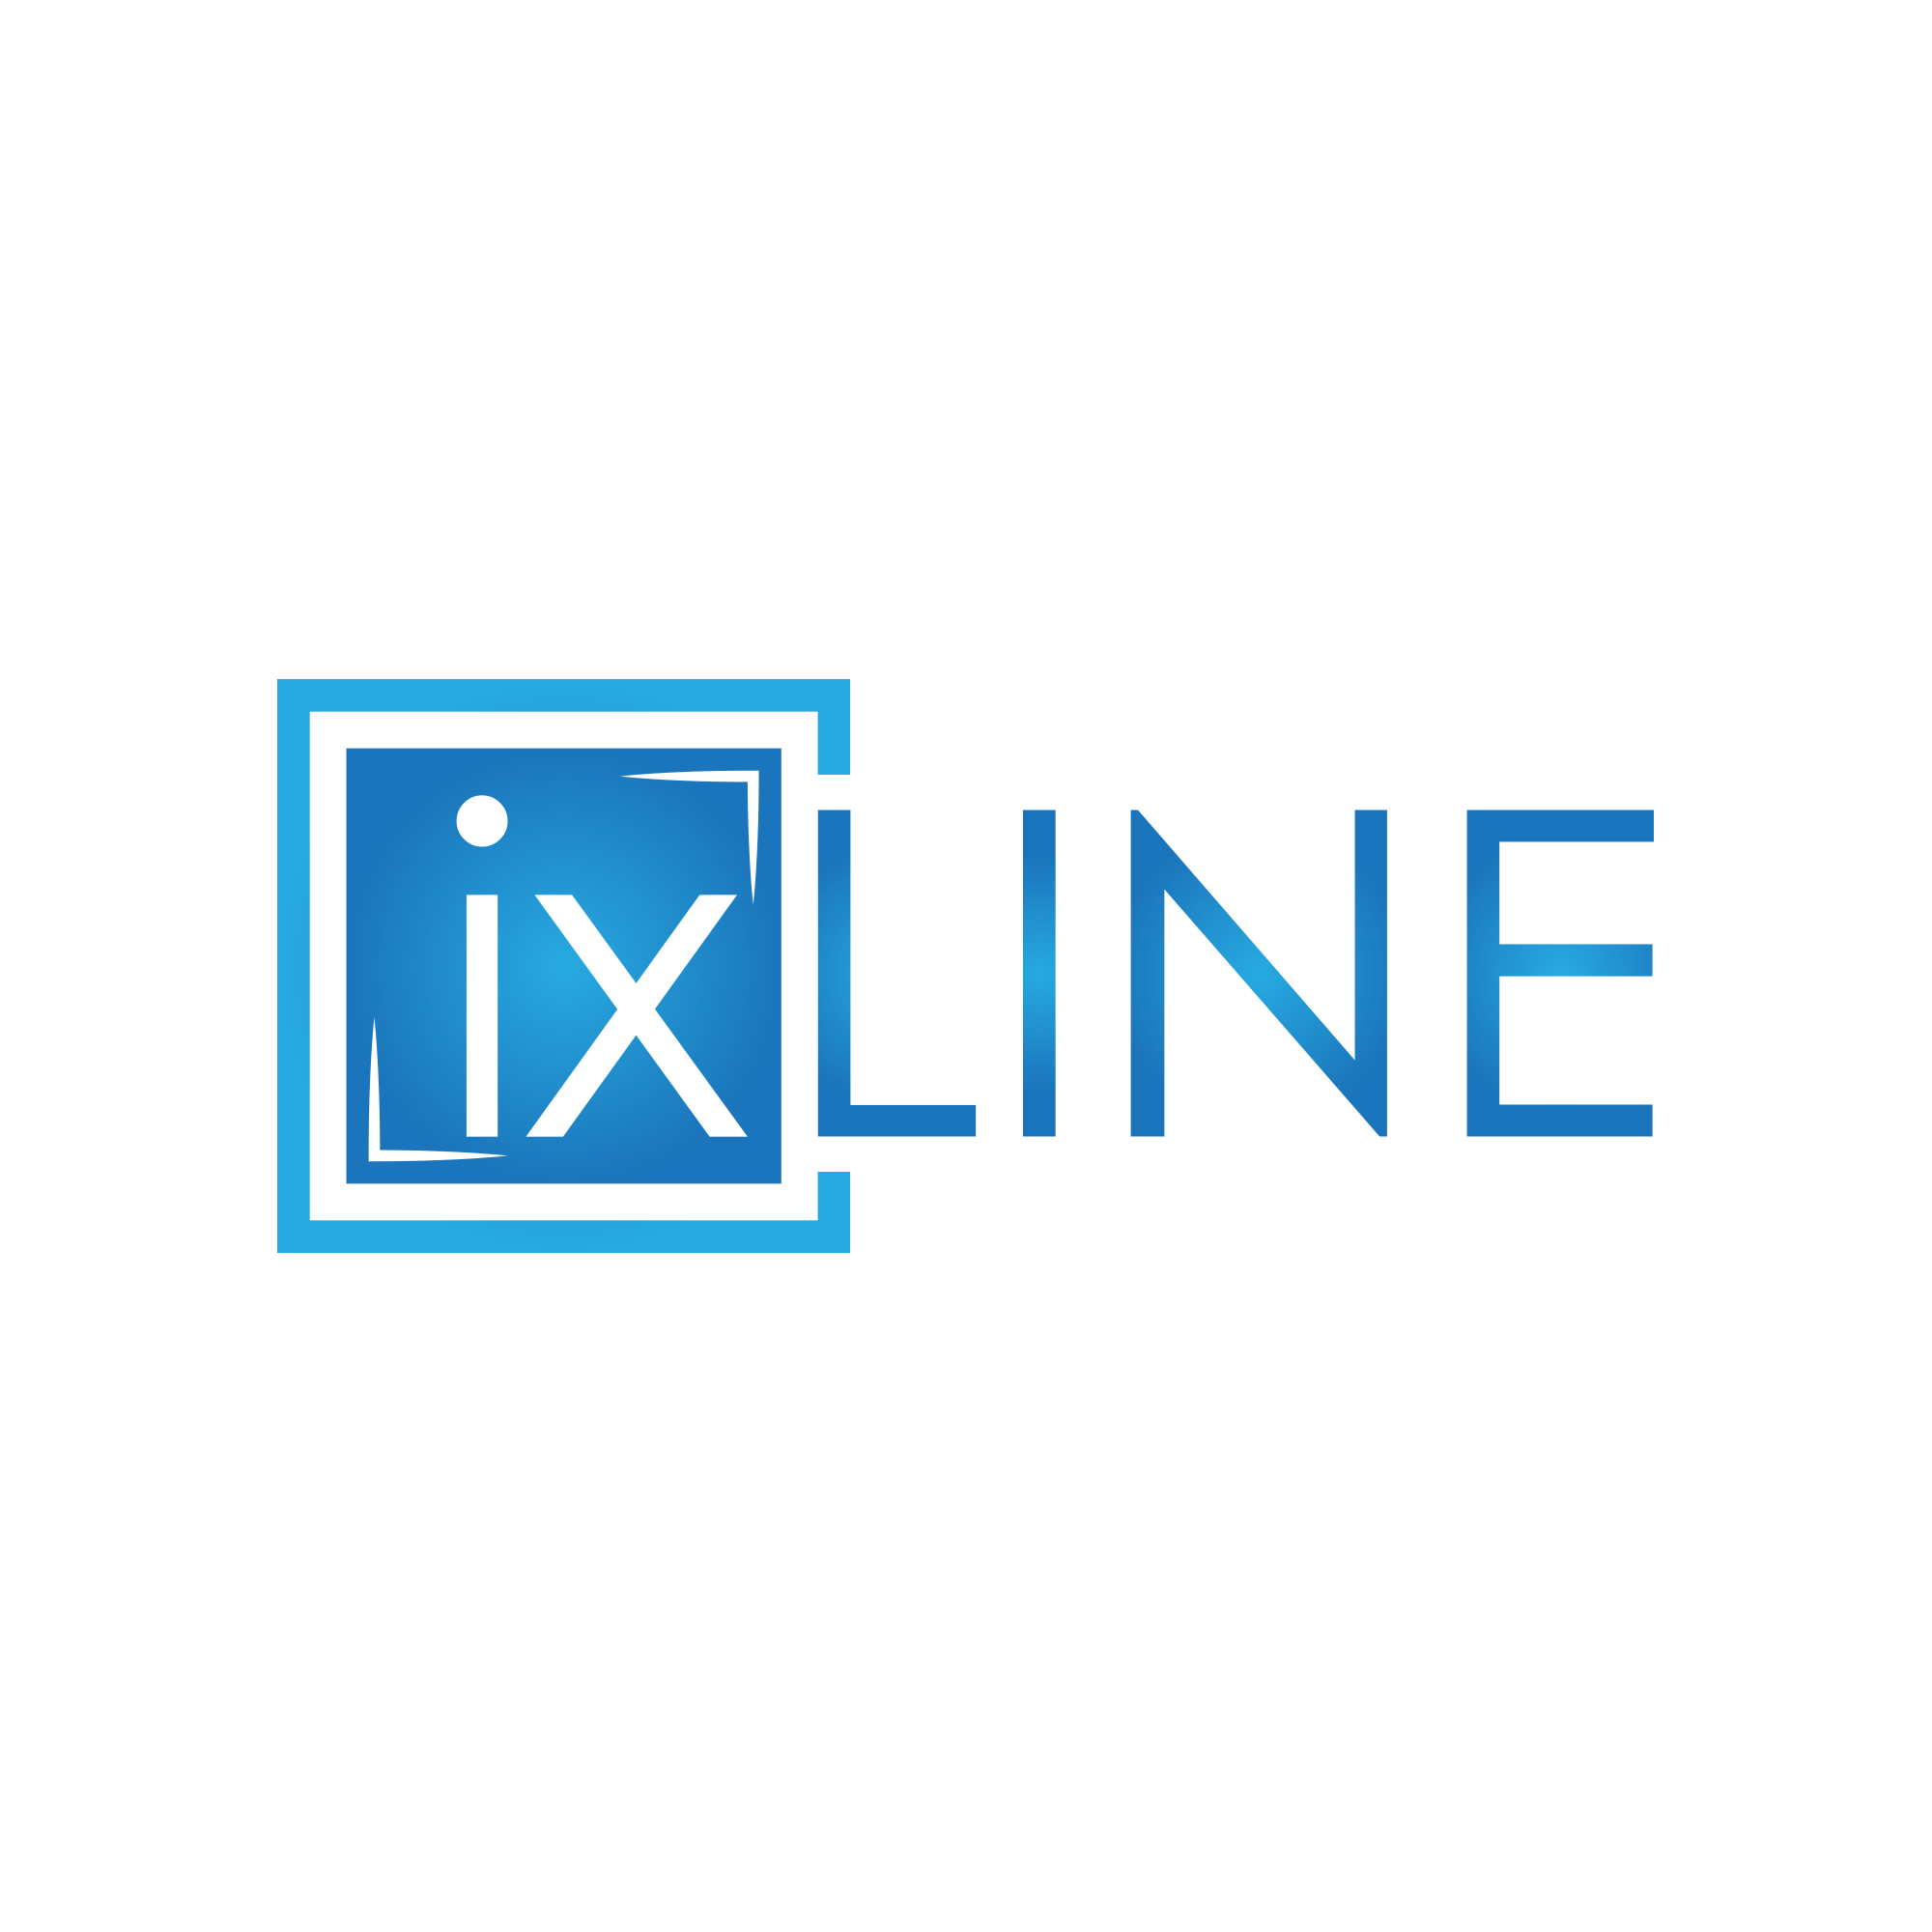 ixLINE